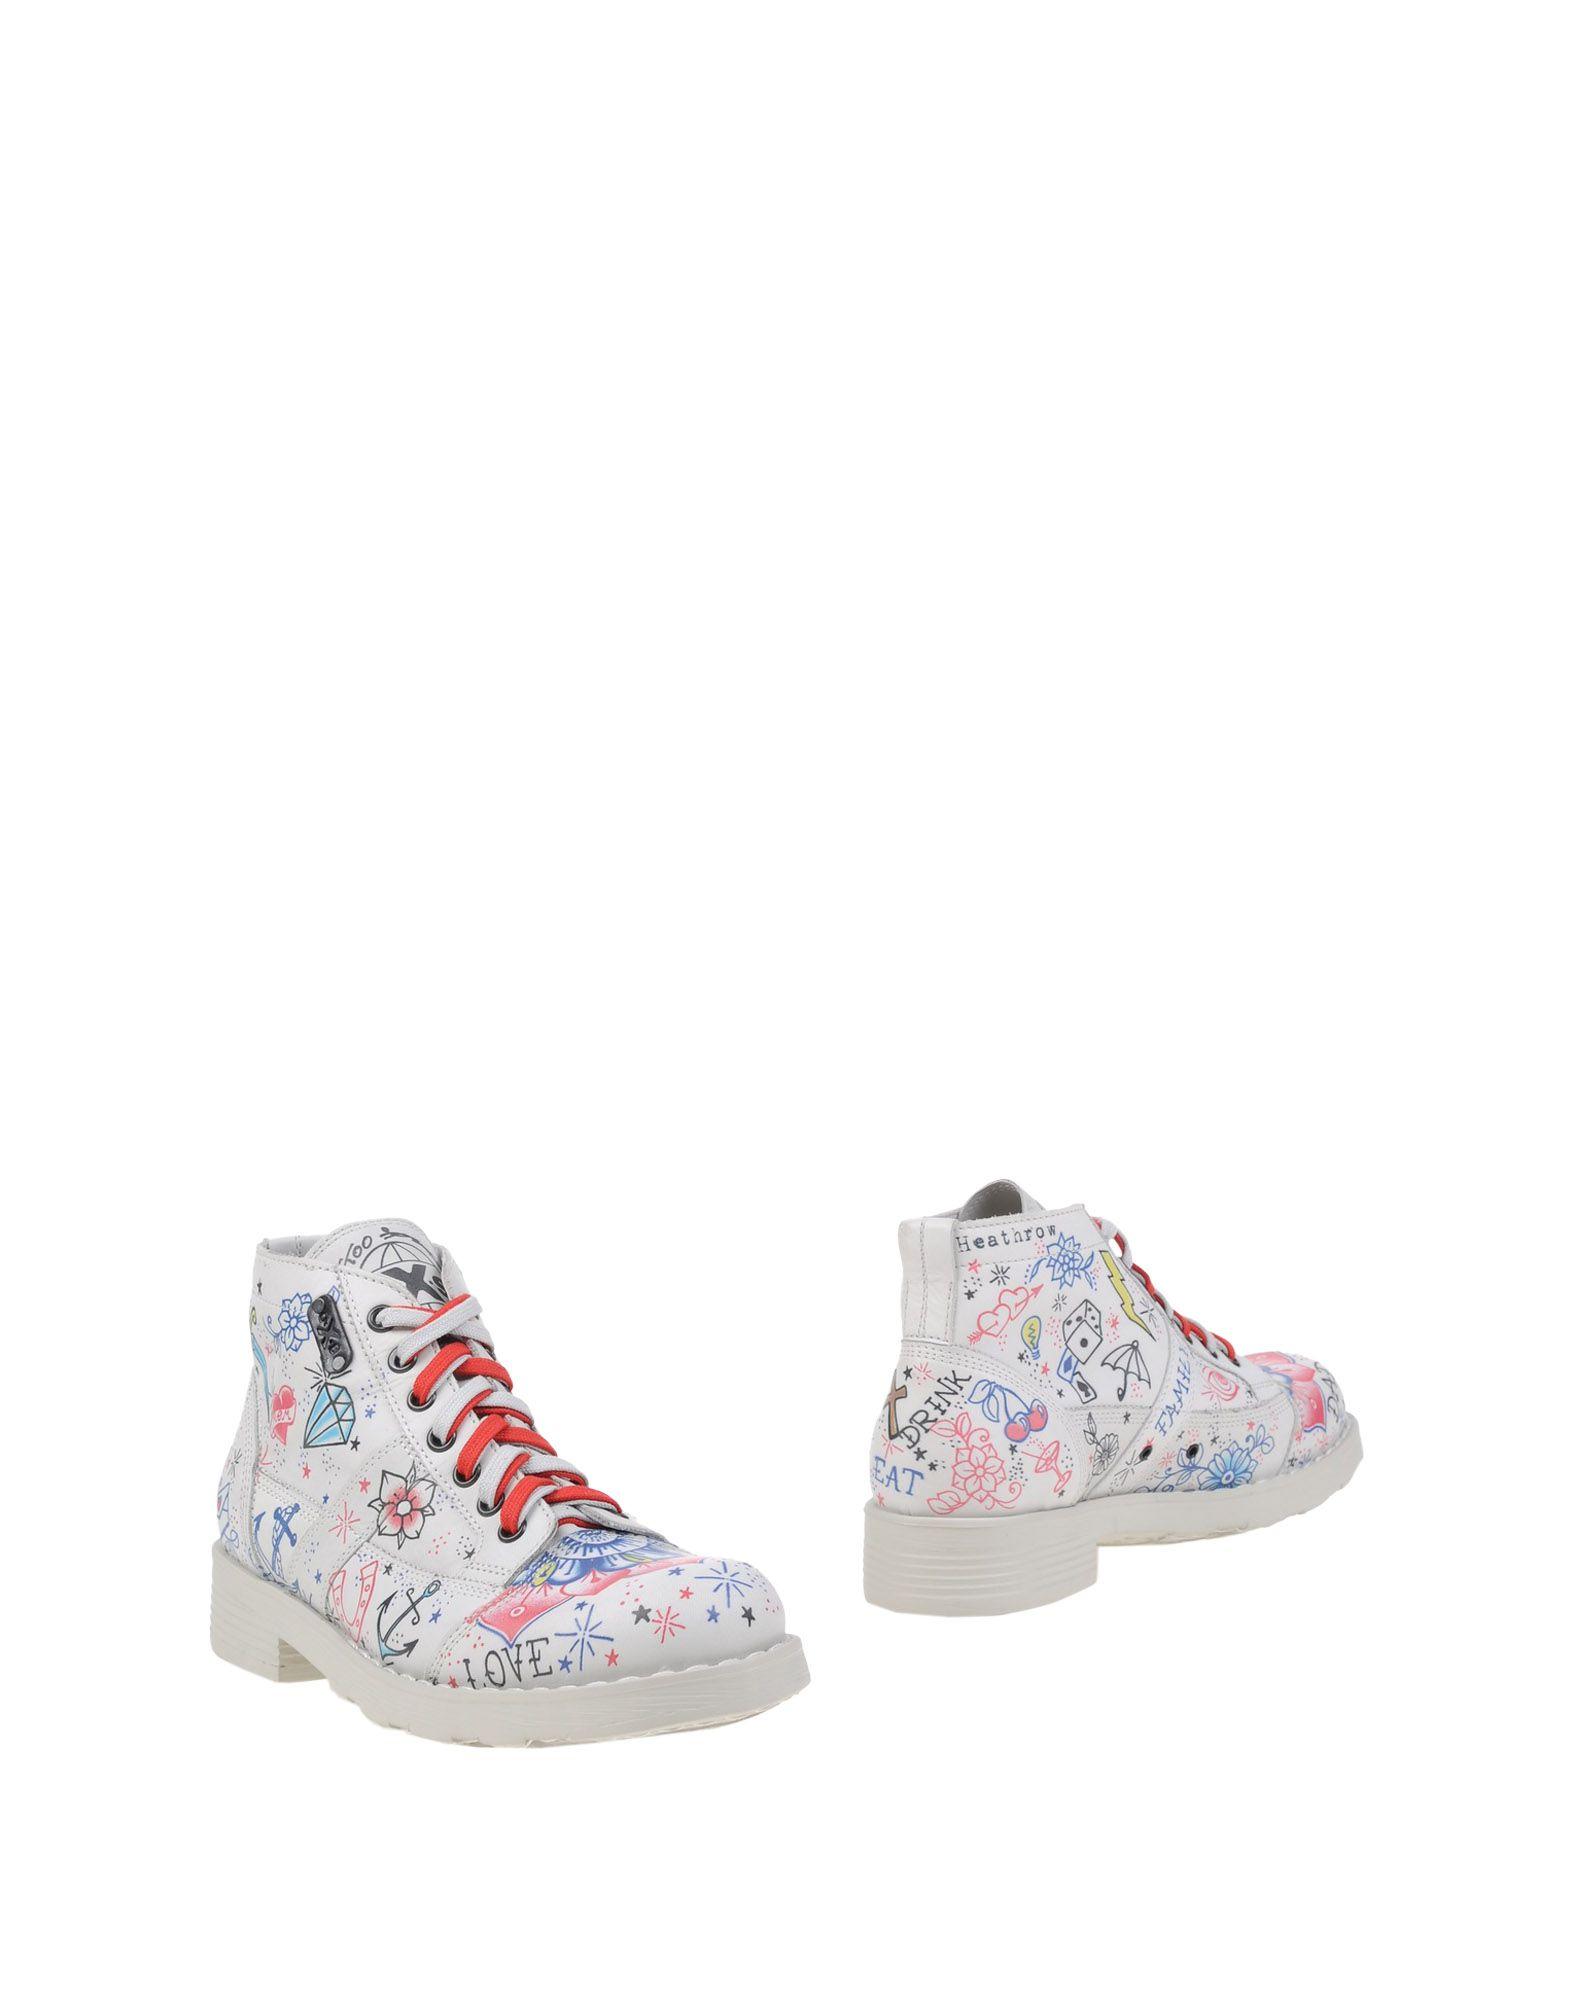 O.X.S. Stiefelette Damen  11119463JP Gute Qualität beliebte Schuhe